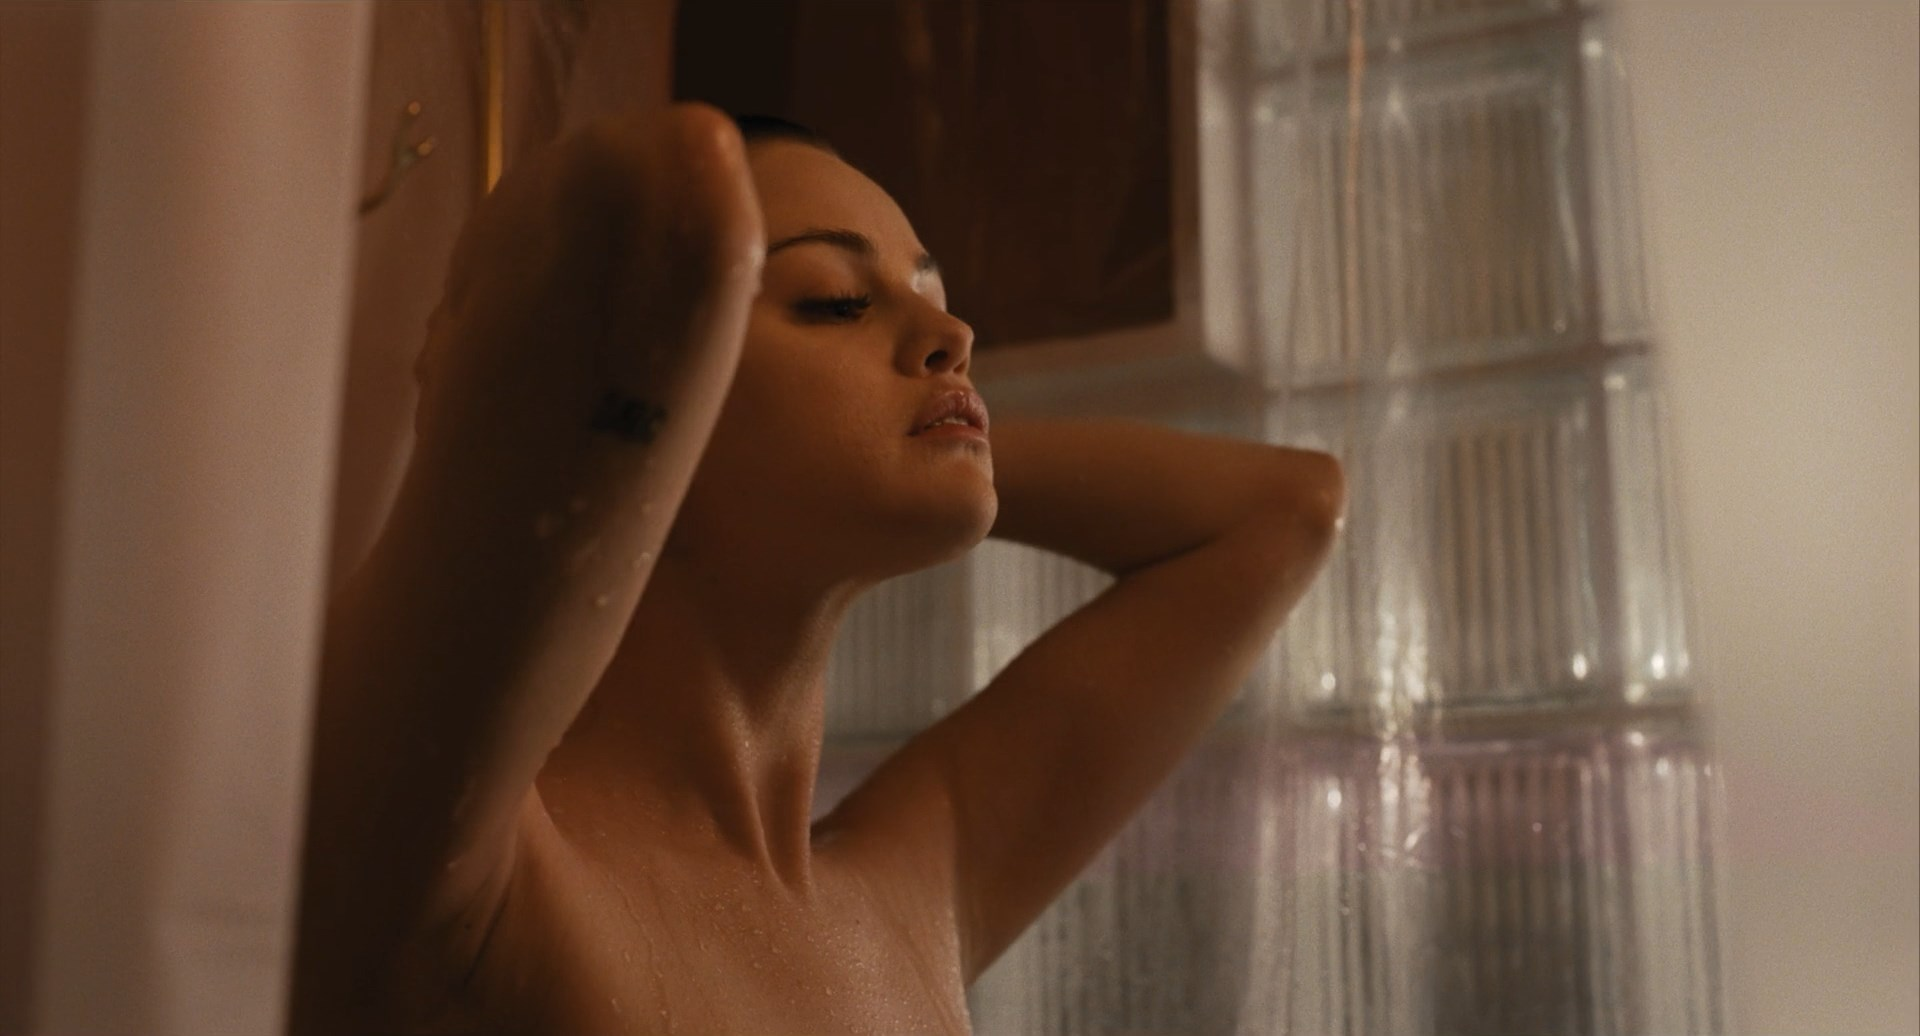 Selena Gomez -Убийства в одном здании 1-2 серии.mkv_snapshot_00.03_[2021.09.02_01.09.19].jpg